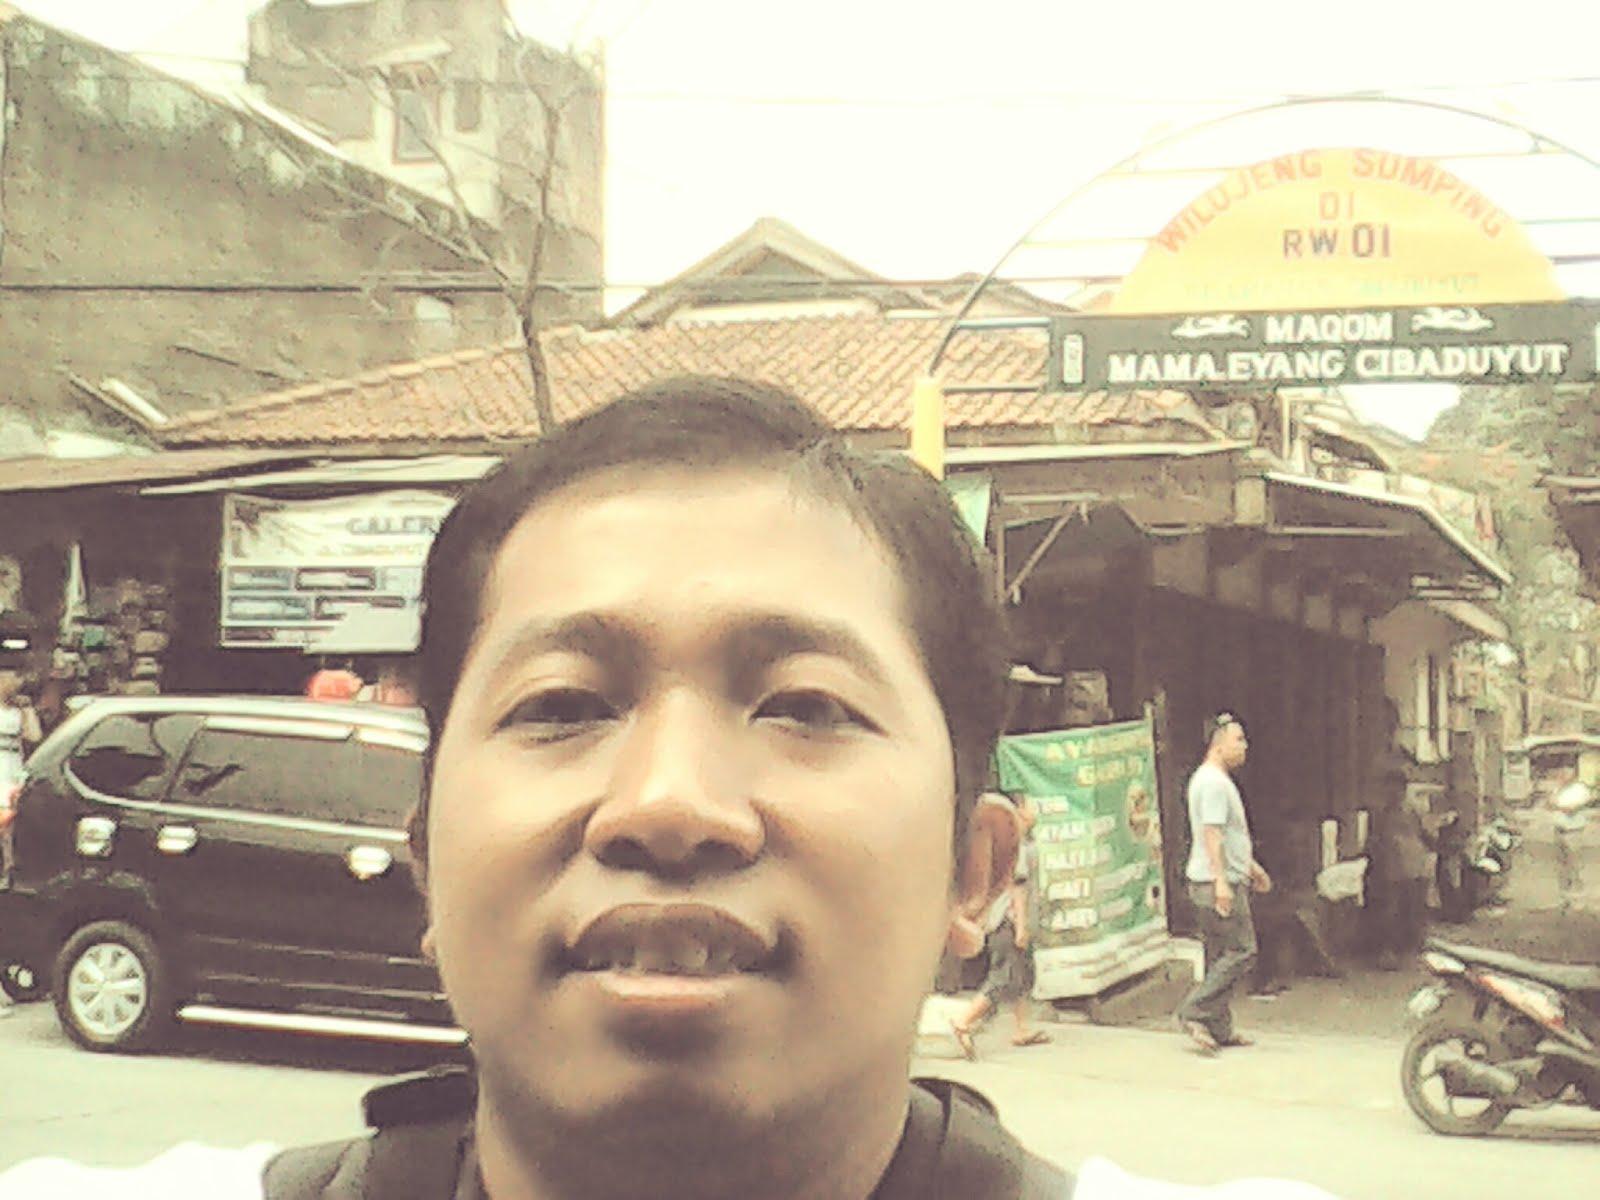 Cibaduyut, Jawa Barat